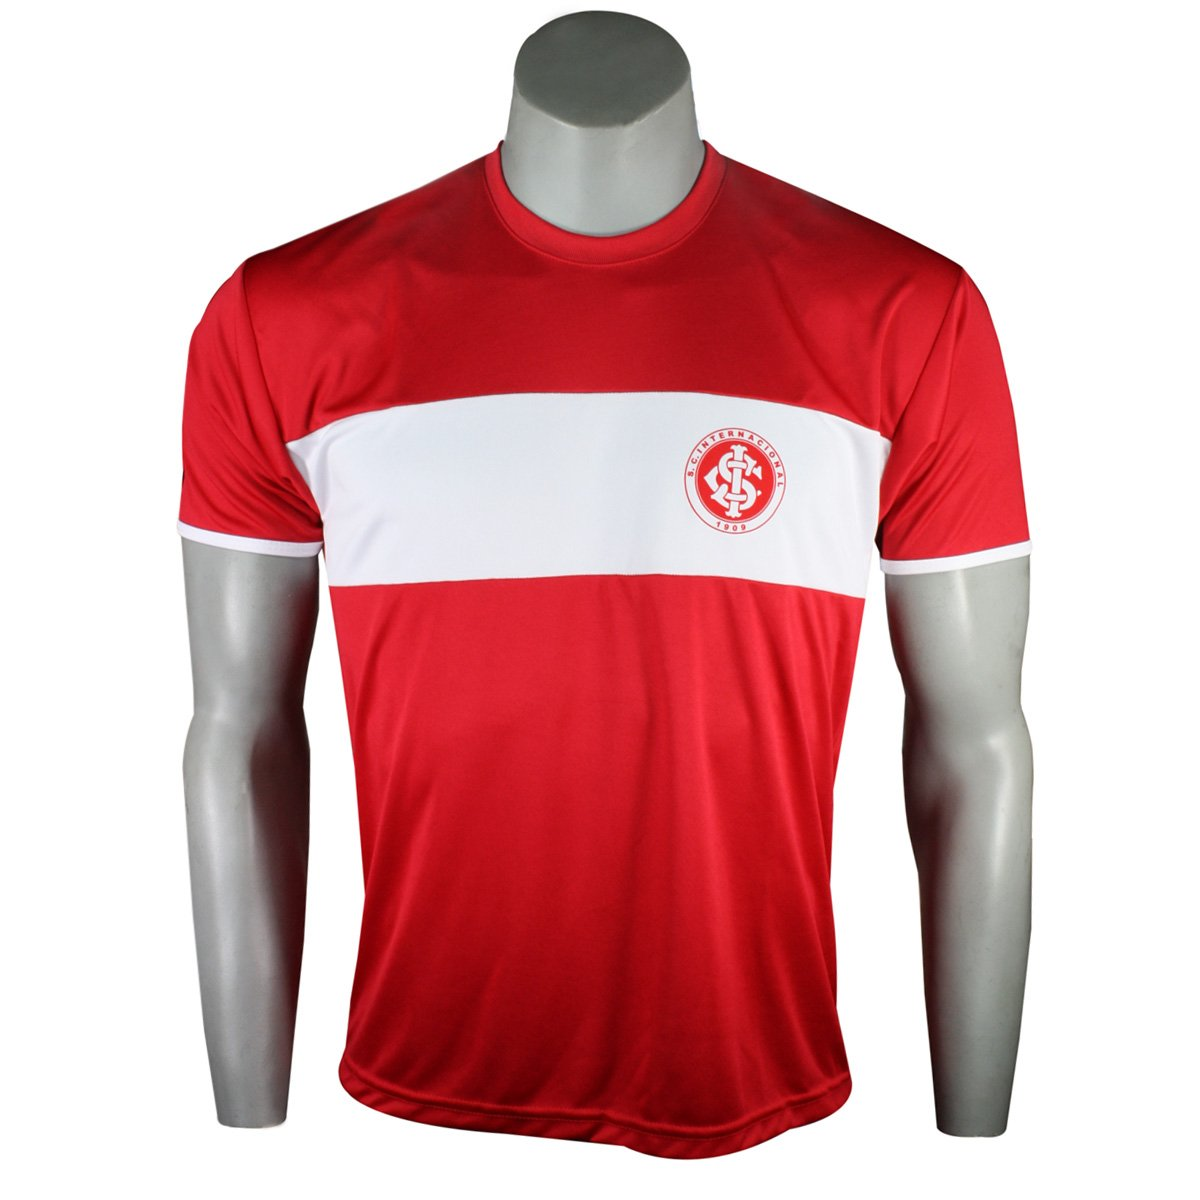 e238779d2a0c6 Camisa Masculina Inter Dilva Oldoni INT437 Vermelho Branco